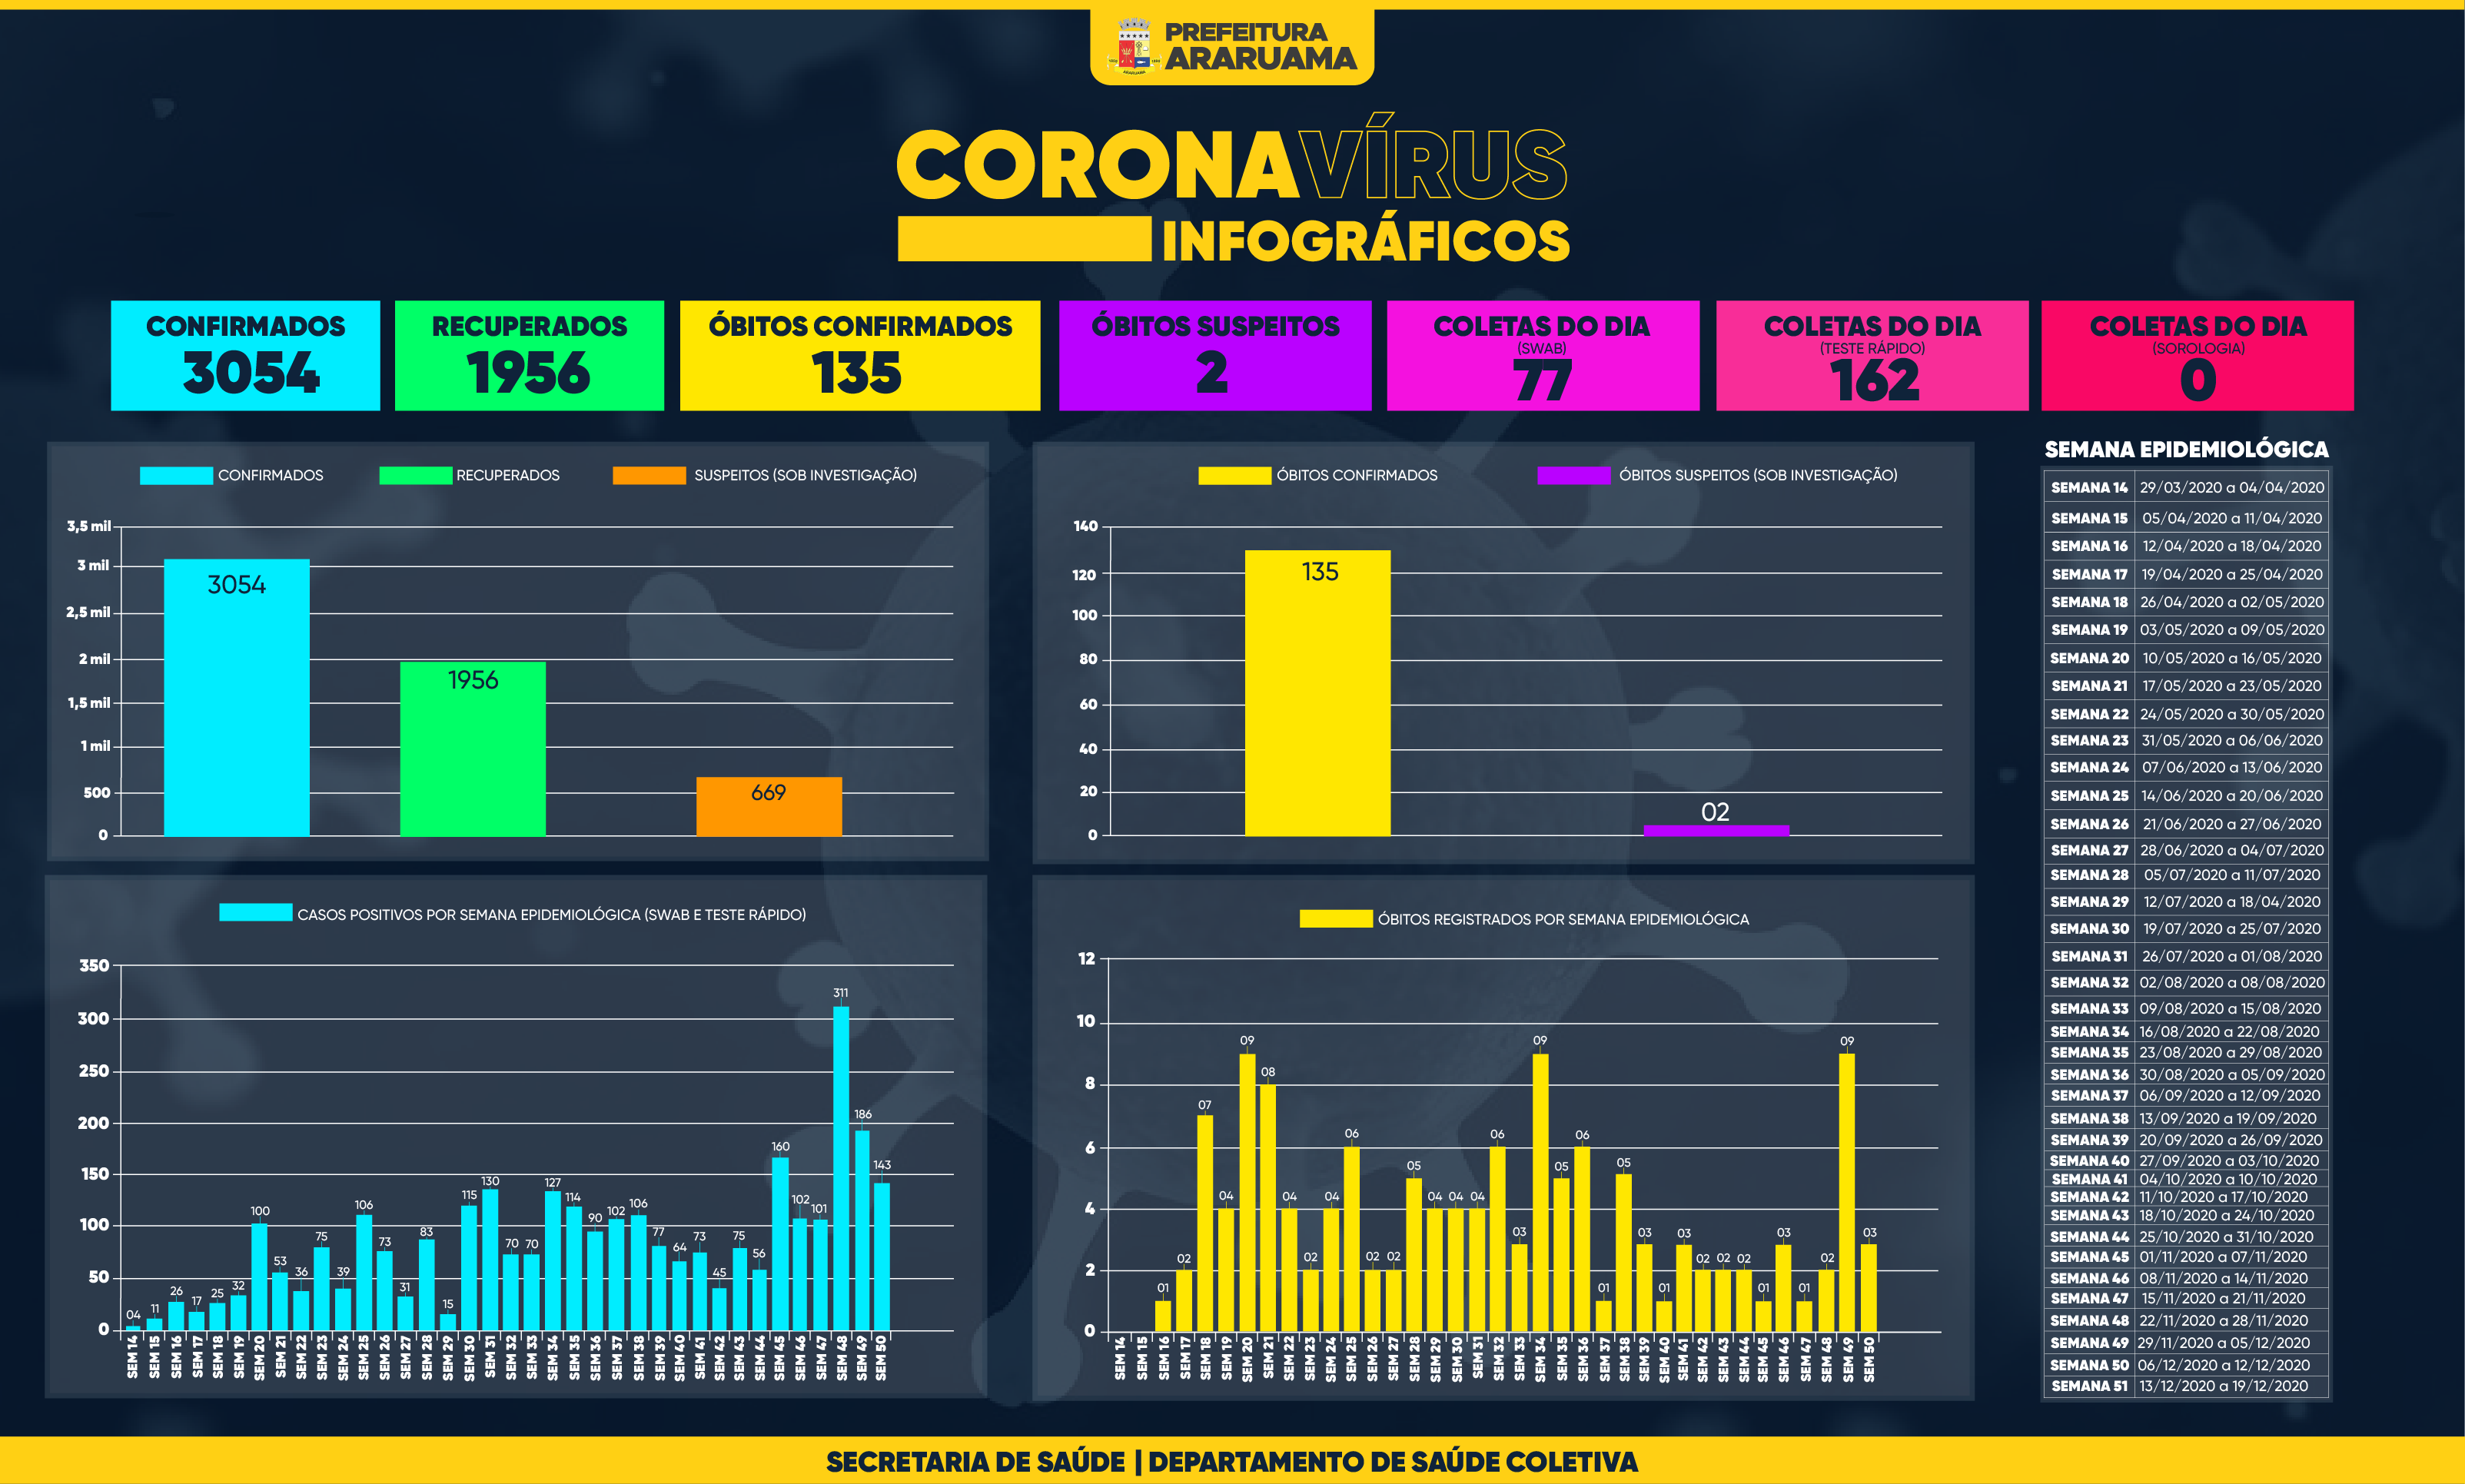 Painel de Monitoramento COVID-19 — Semana 51 — 14 de dezembro de 2020